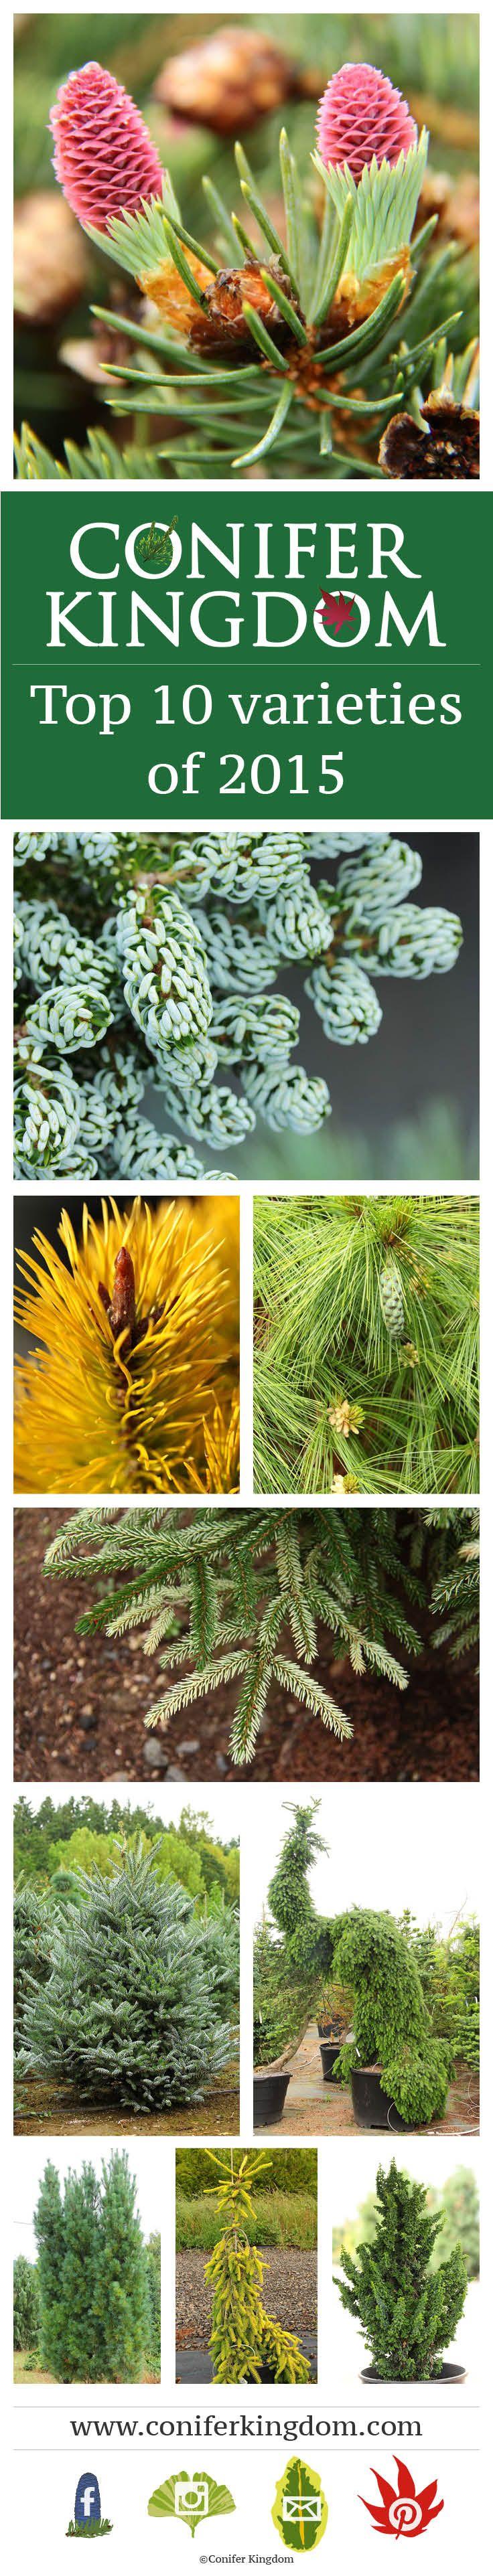 Our top 10 varieties of 2015. 1. Picea pungens 'Ruby Teardrops' 2. Abies koreana 'Kohout's Ice Breaker' 3. Pinus contorta 'Chief Joseph' 4. Pinus x. schwerinii 'Wiethorst' 5. Picea orientalis 'Silver Seedling' 6. Abies koreana 'Horstmann's Silberlocke' 7. Picea omorika 'Pendula Bruns' 8. Pinus strobus 'Stowe Pillar' 9. Picea abies 'Gold Drift' 10. Chamaecyparis obtusa 'Chirimen' Read more about each of the varieties on our blog » http://blog.coniferkingdom.com/top-10-varieties-of-2015/